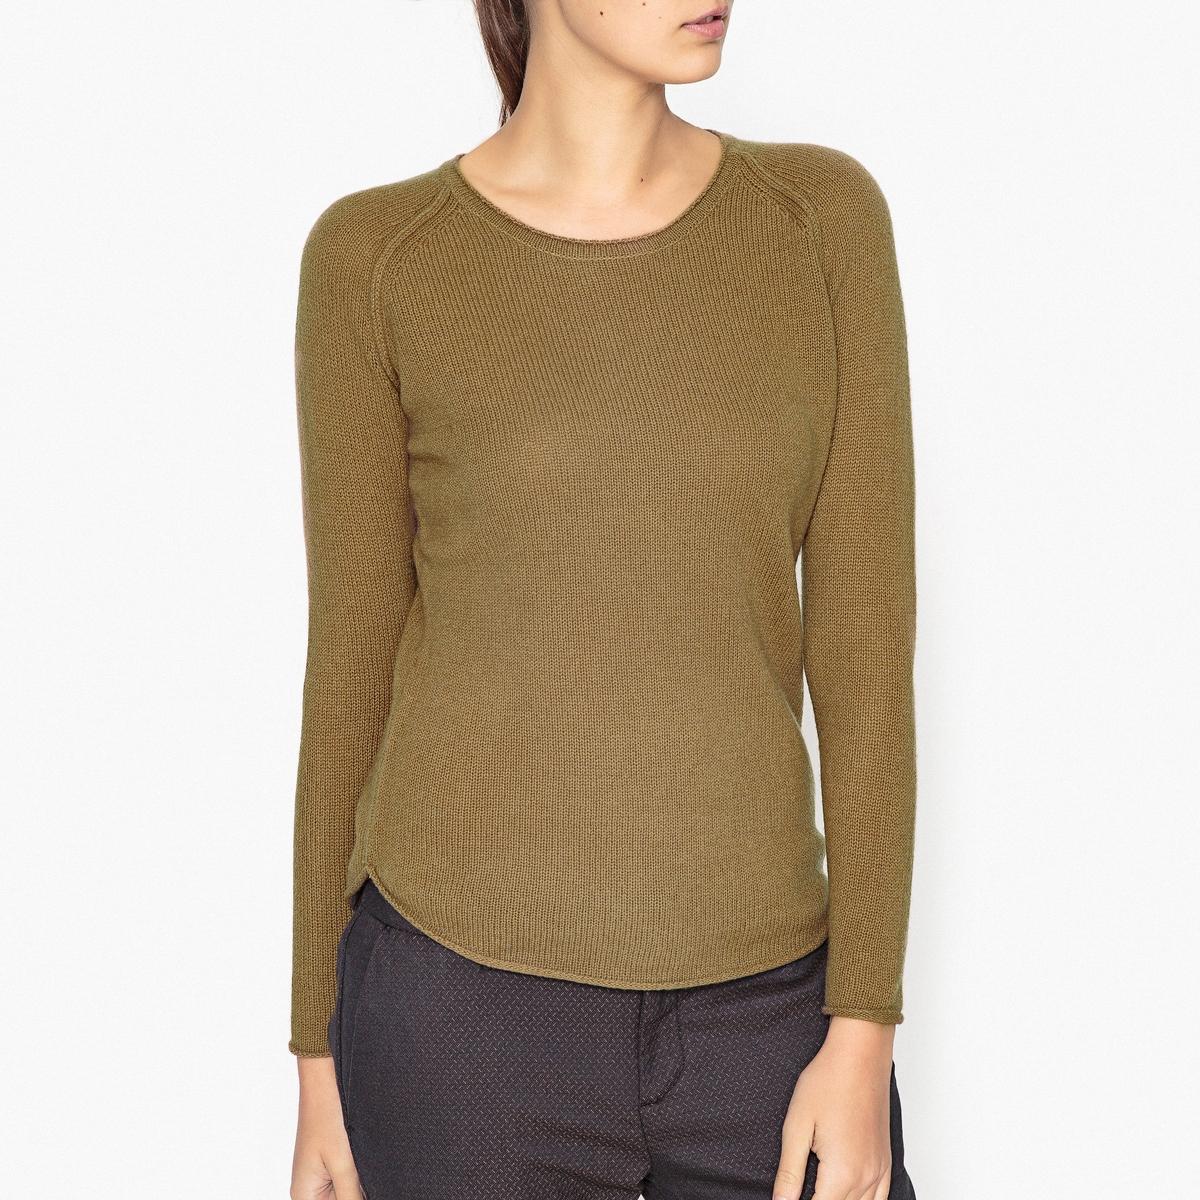 Пуловер из шерсти и кашемира меланж EXABIRD